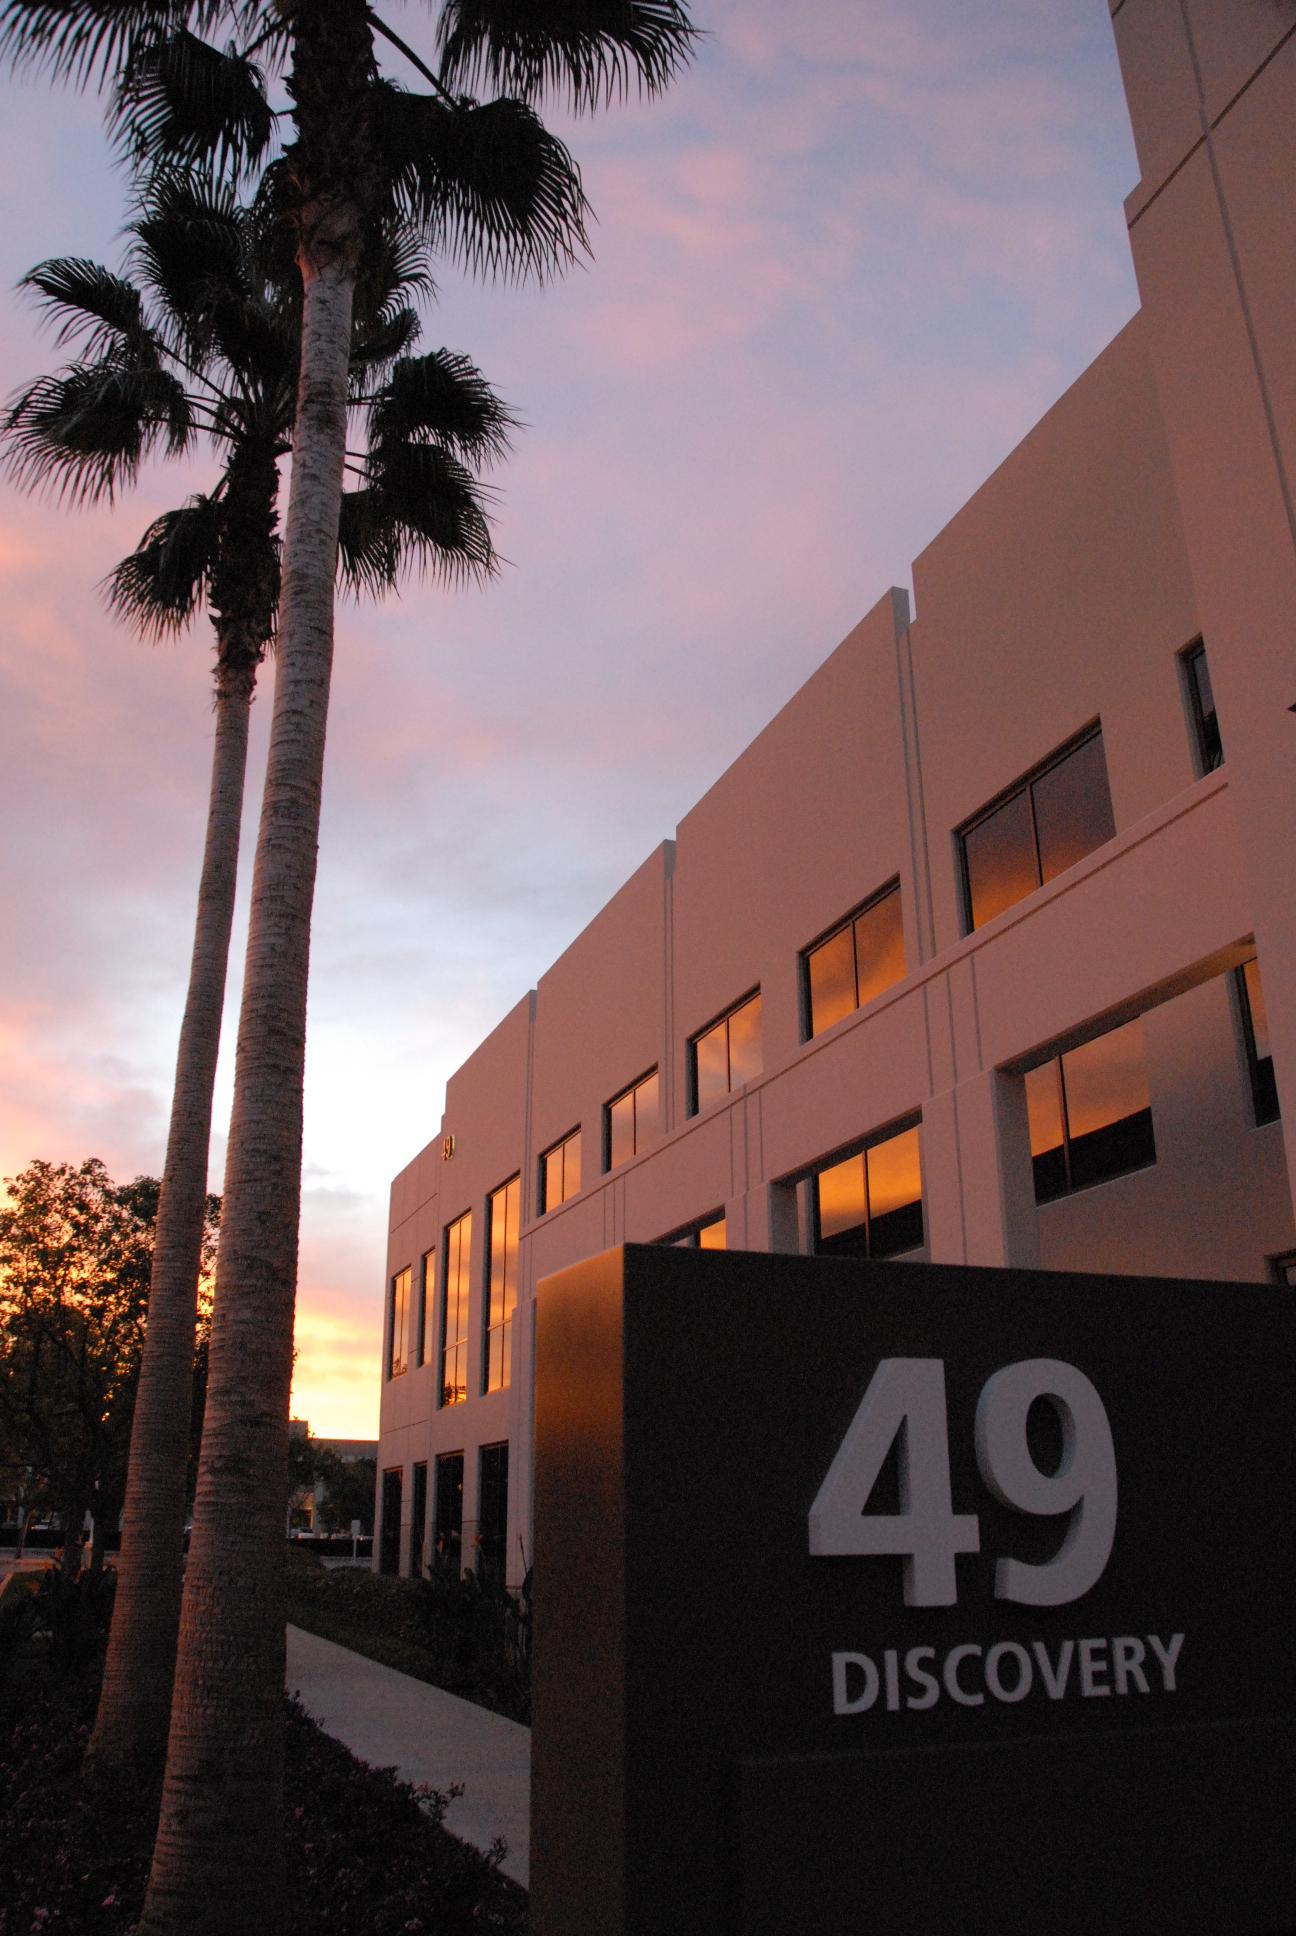 49 Discovery.JPG